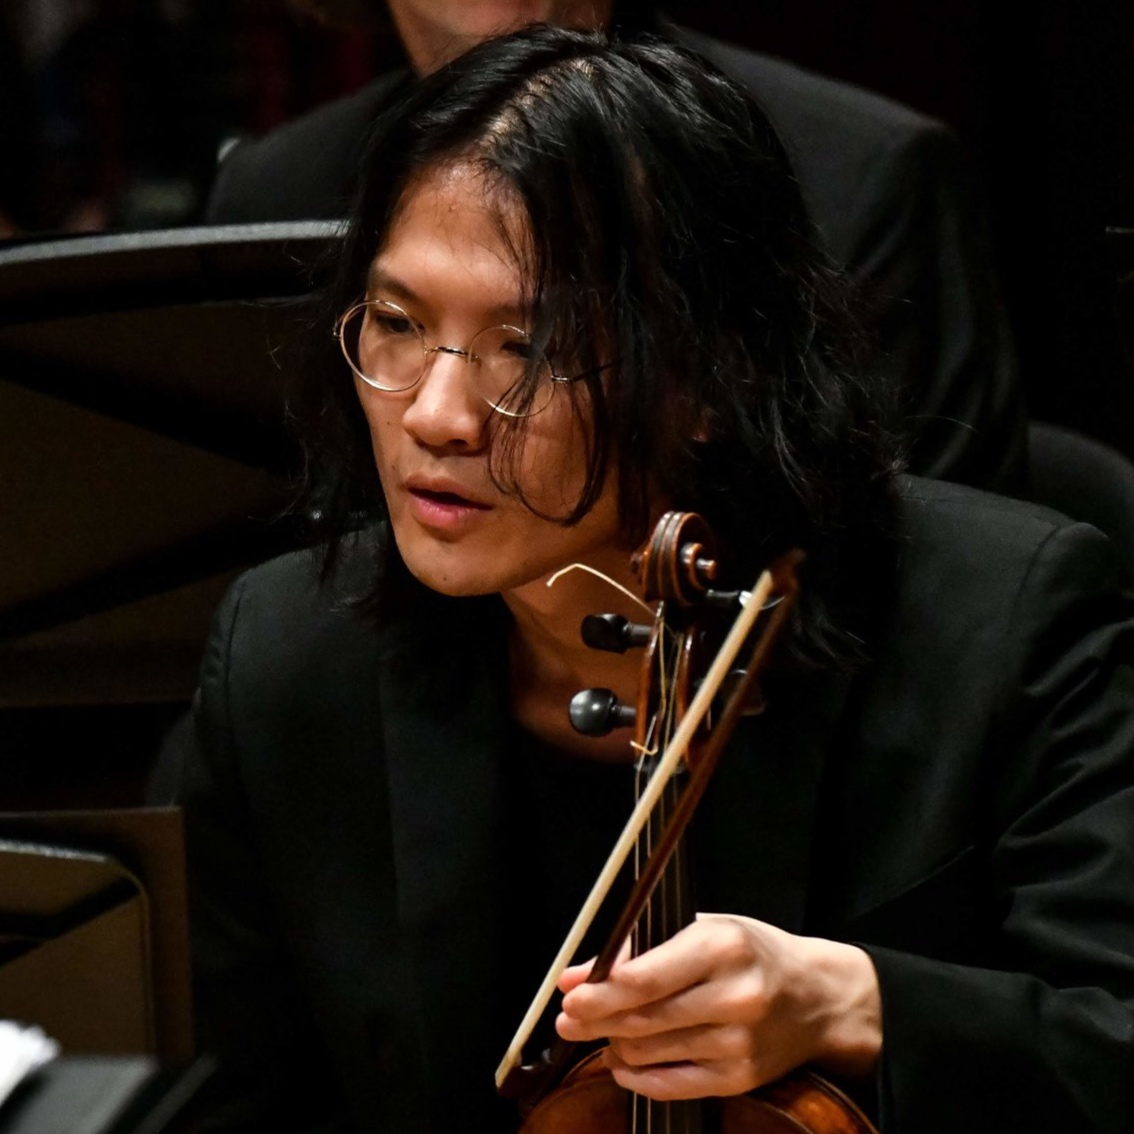 Tatsuya HATANO 畑野達哉 - Baroque Violin | 巴洛克小提琴